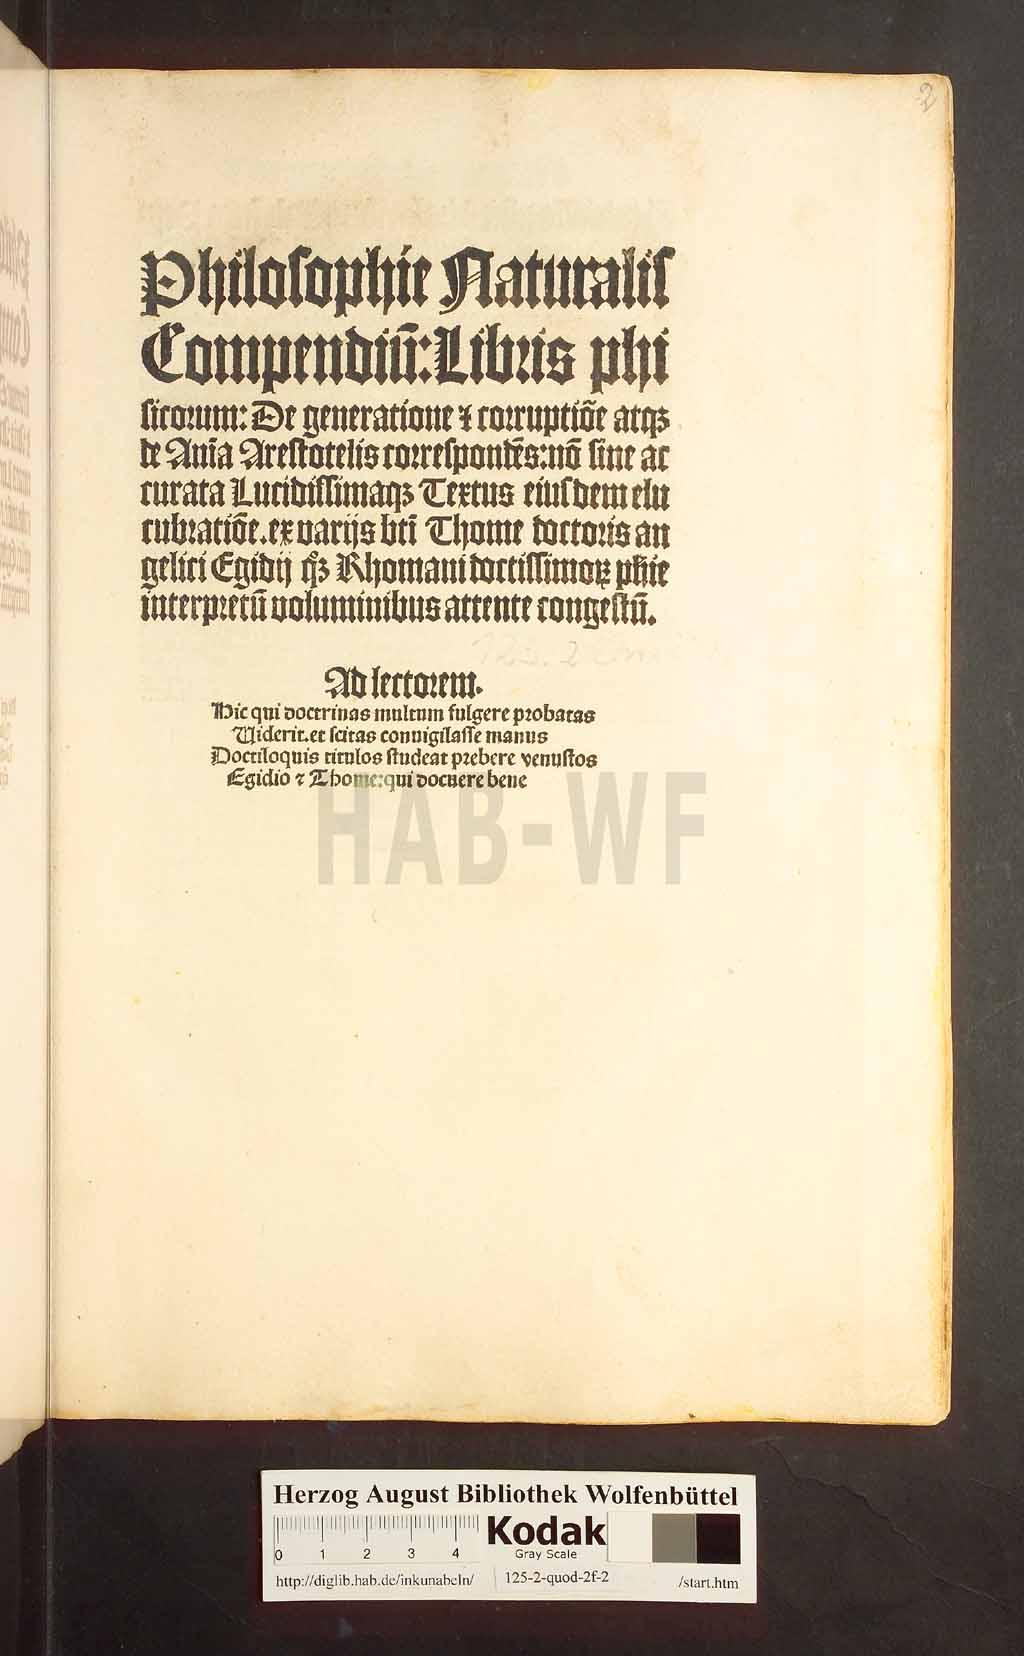 http://diglib.hab.de/inkunabeln/125-2-quod-2f-2/00001.jpg